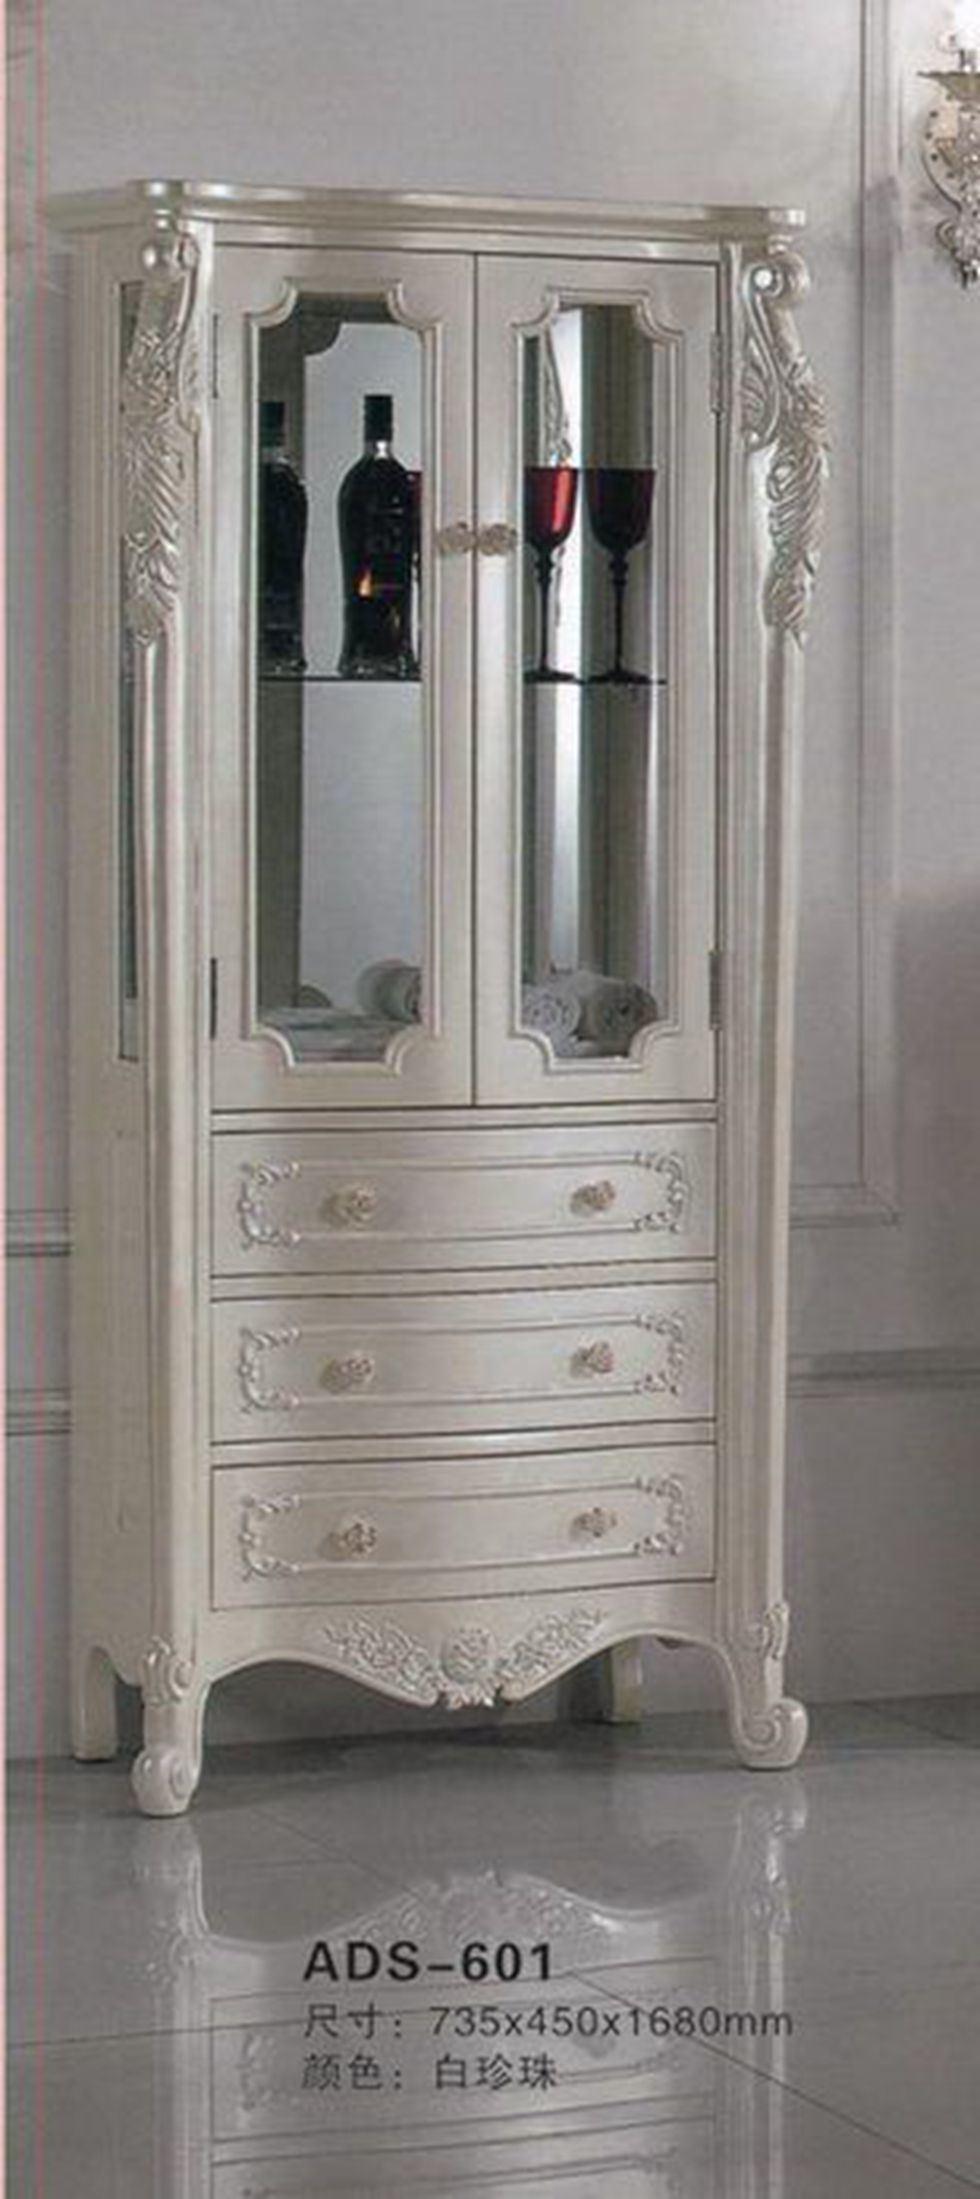 European Style Bathroom Sanitary Ware Bathroom Caient (601)